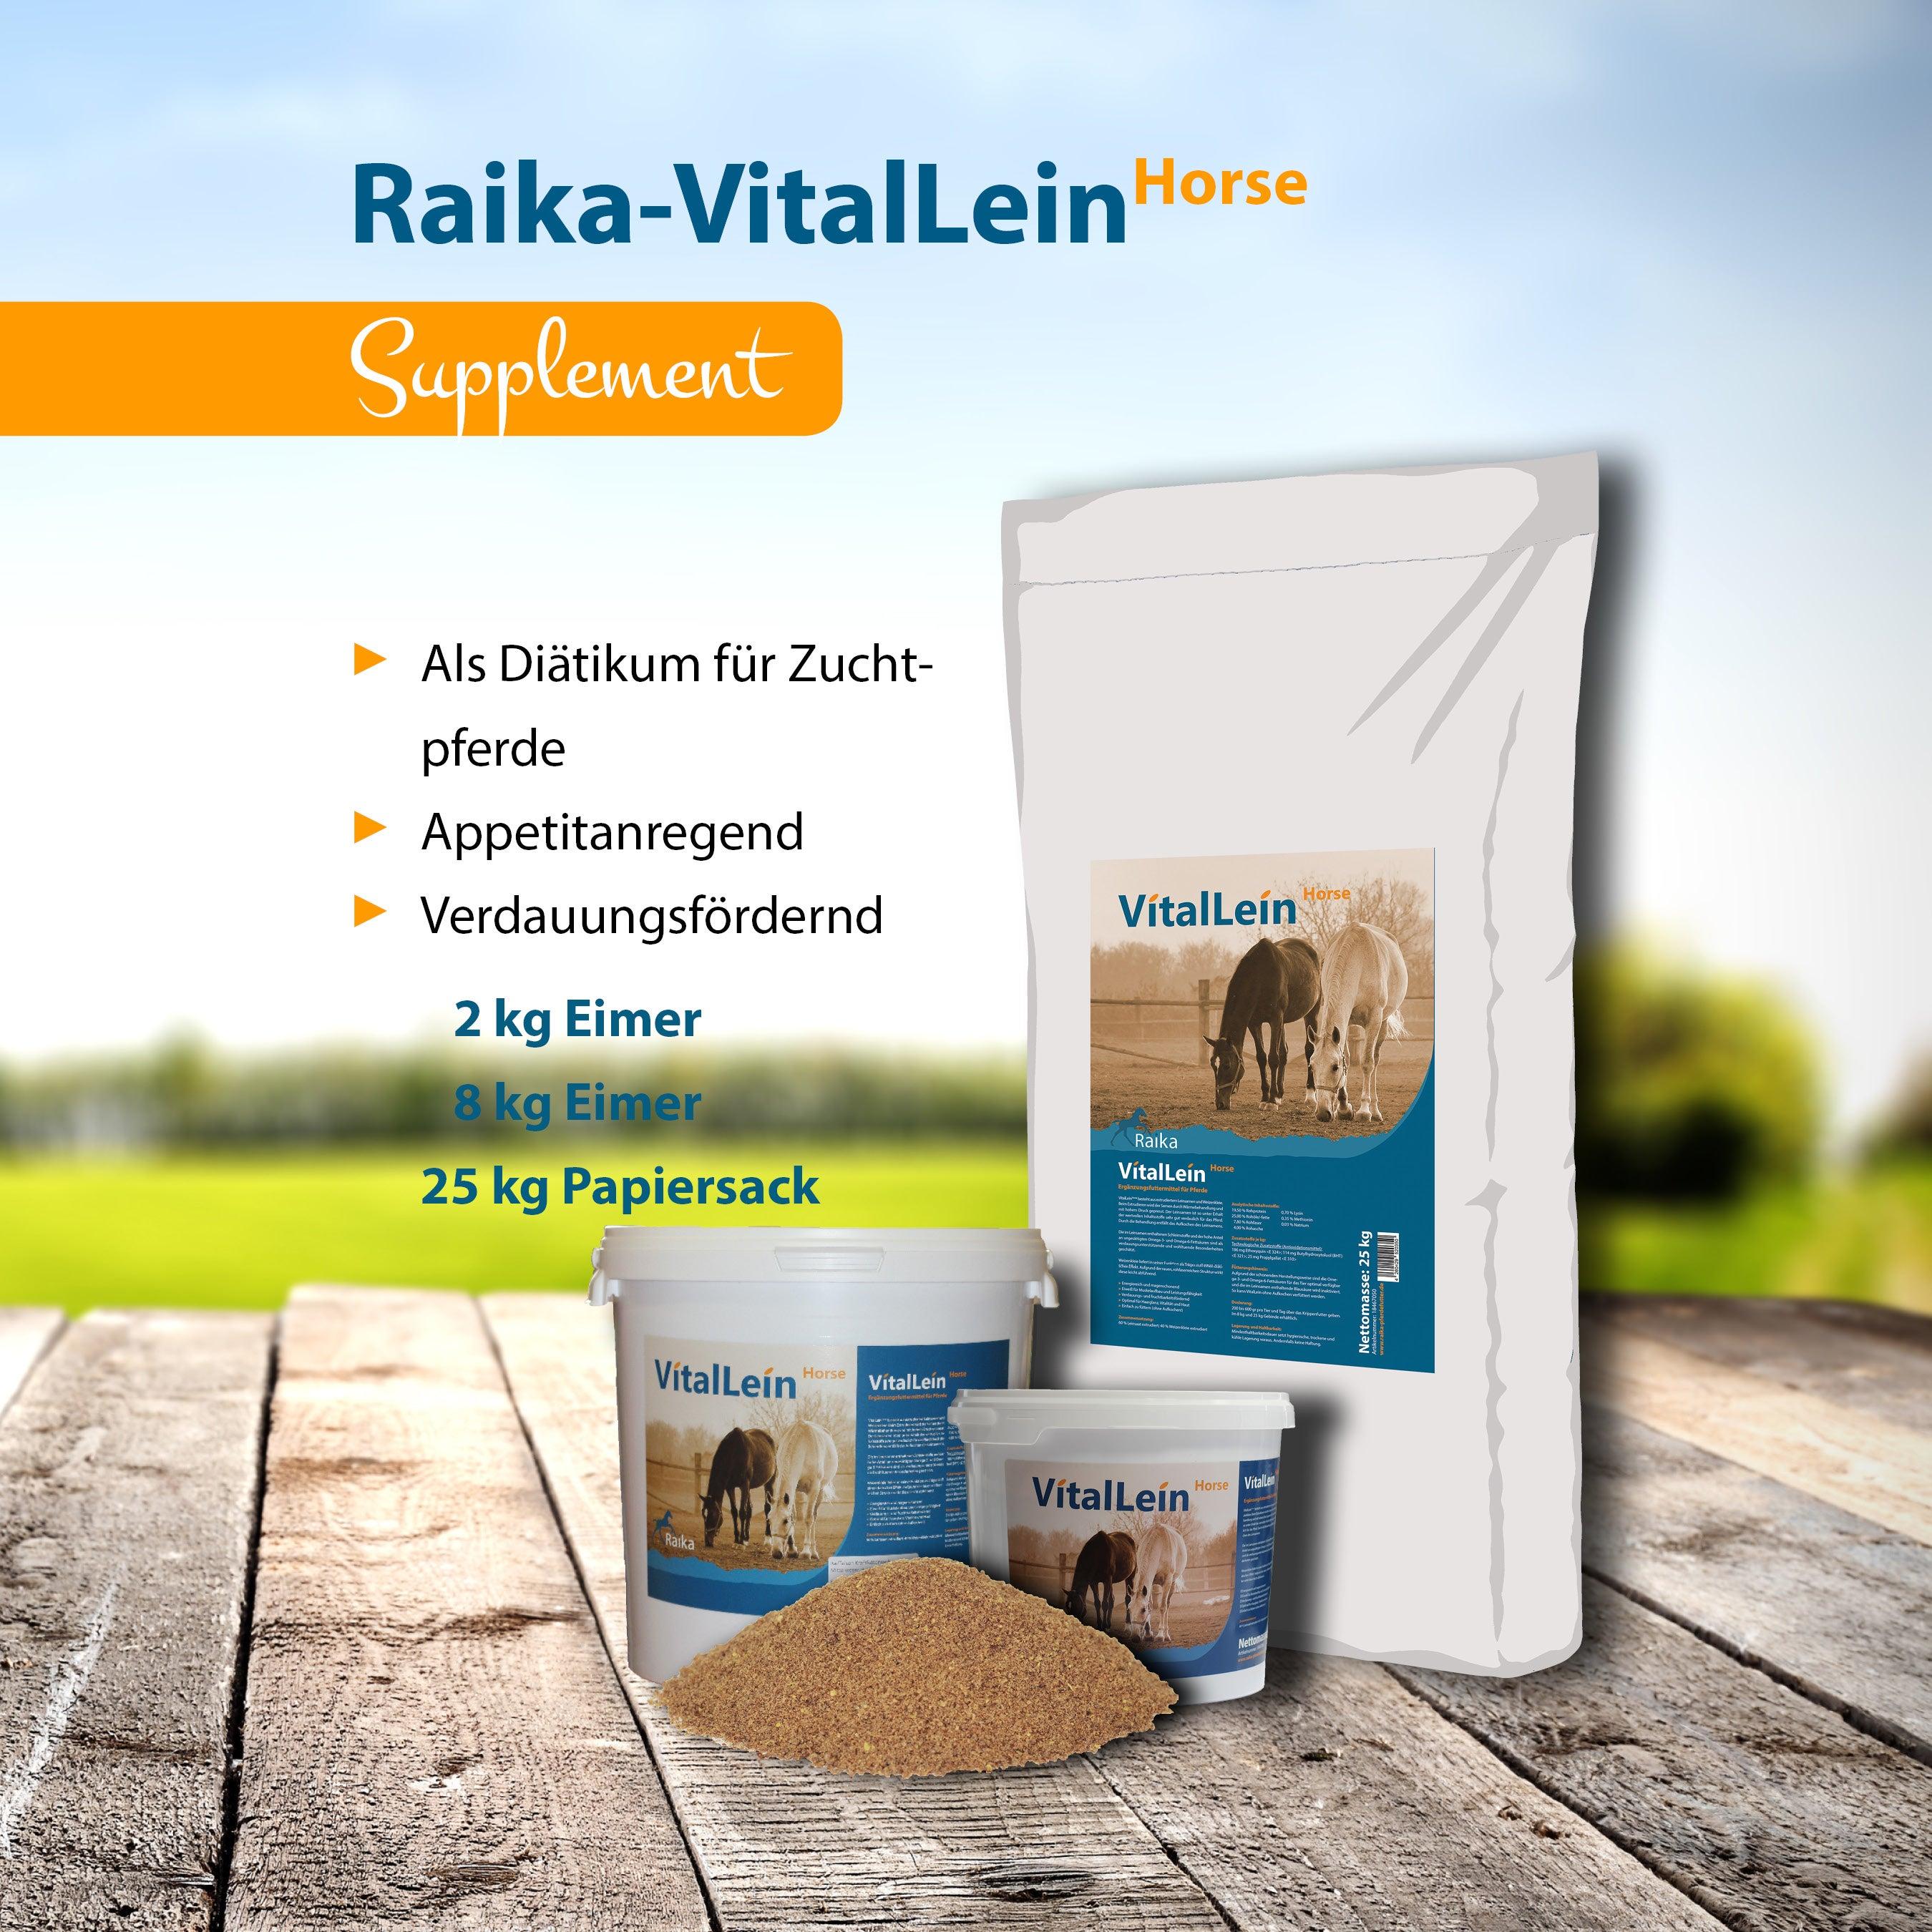 Raika-VitalLein Horse Pferdefutter